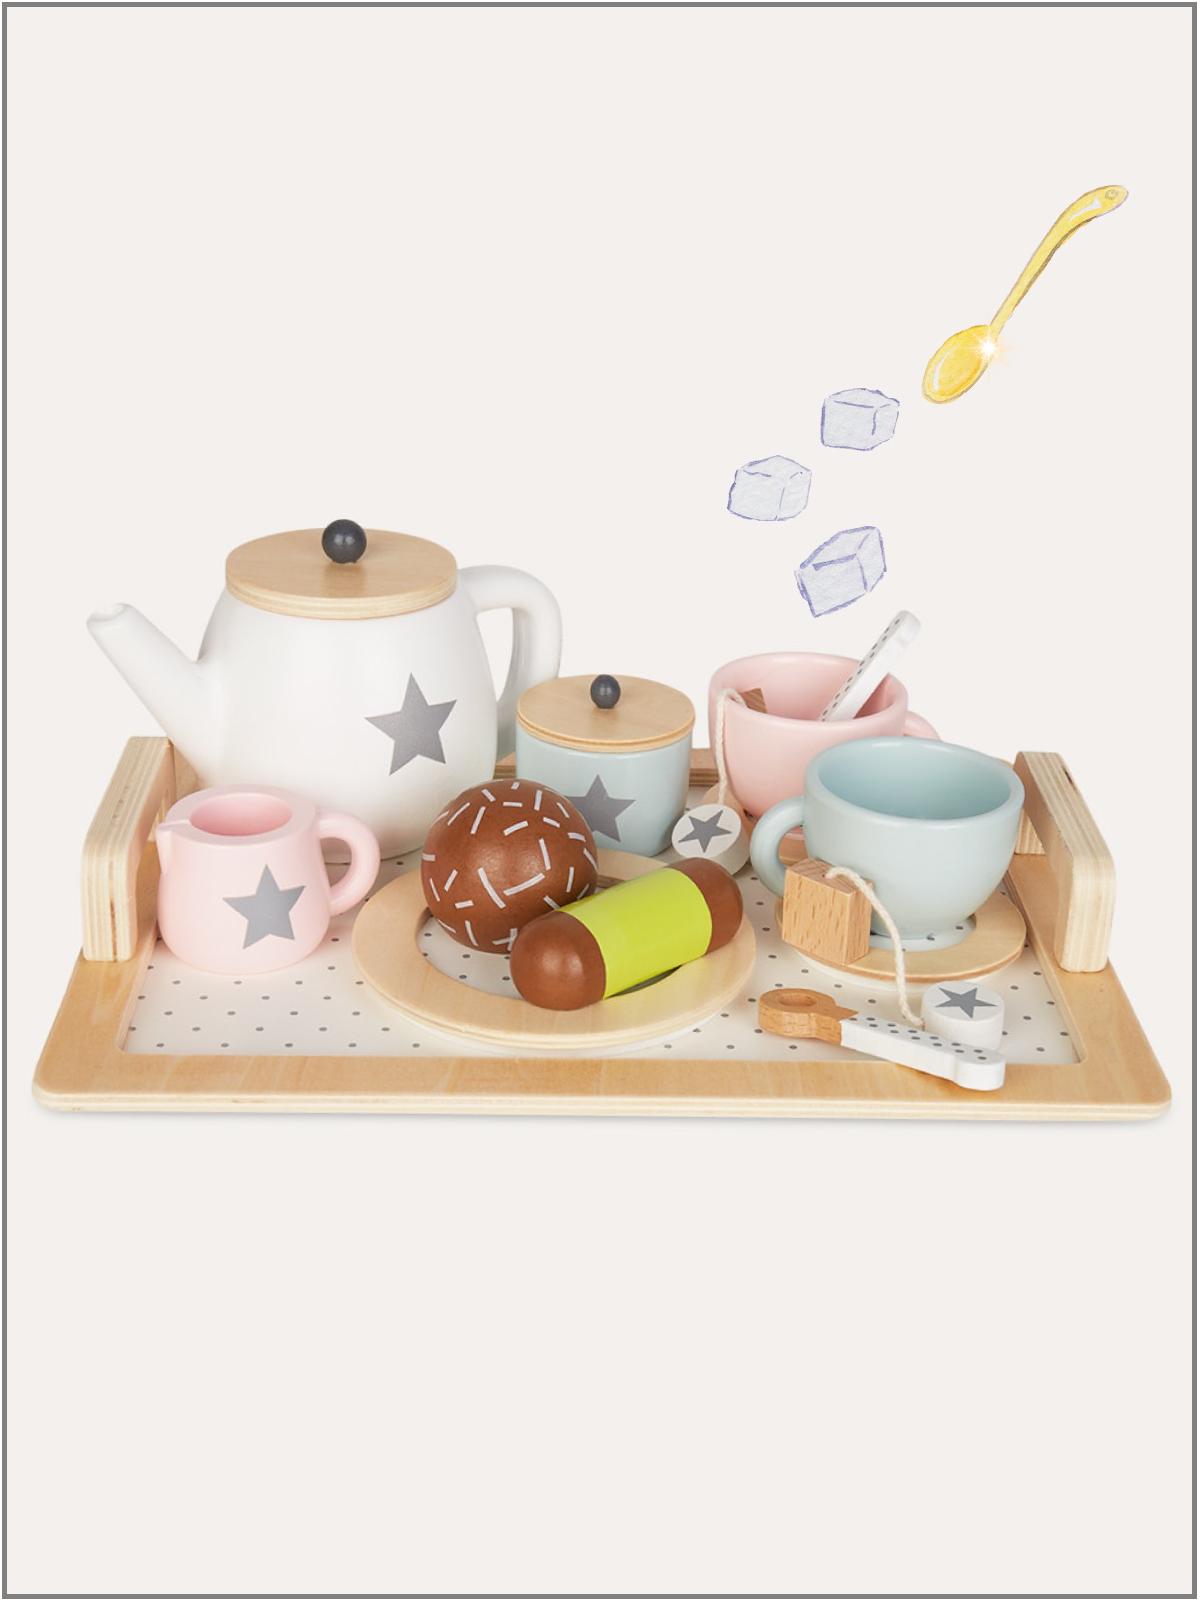 frederickandsophie-kids-toys-jabadabado-afternoon-tea-set-wooden-pretend-play